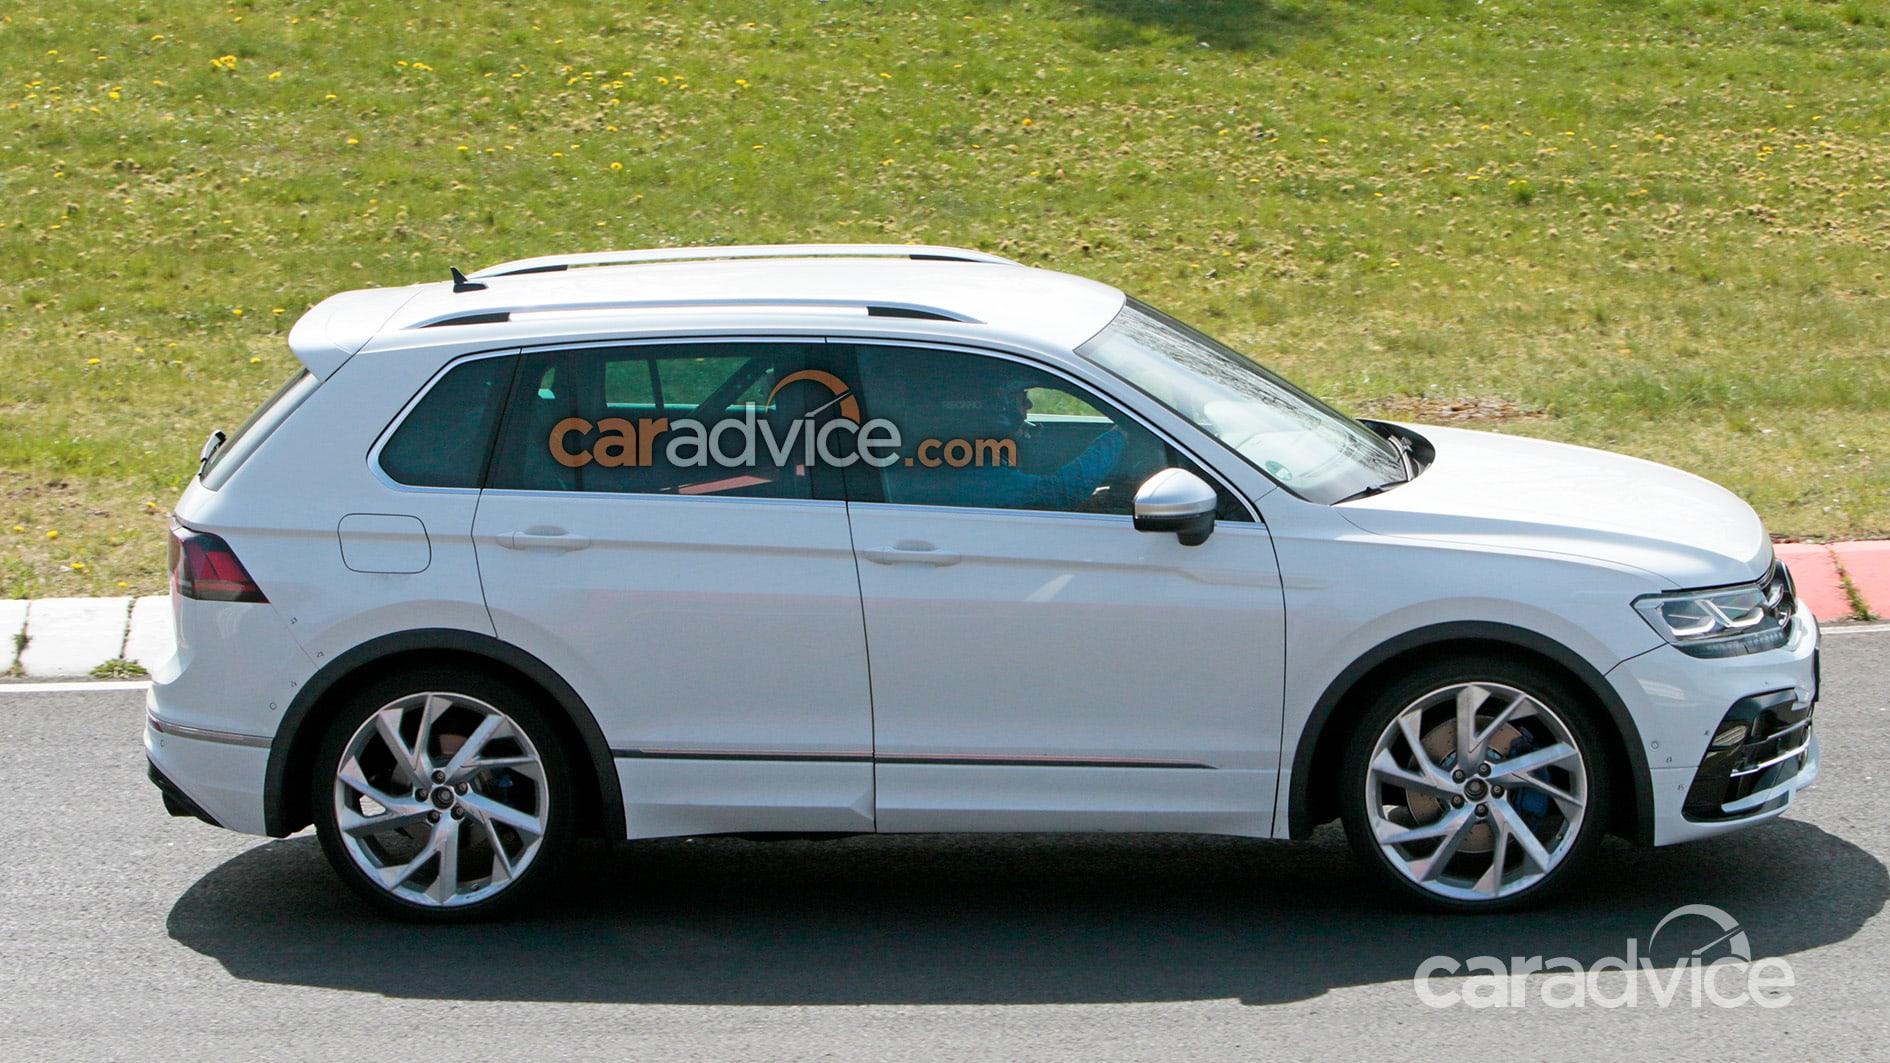 2021 Volkswagen Tiguan R spied during Nurburgring testing ...